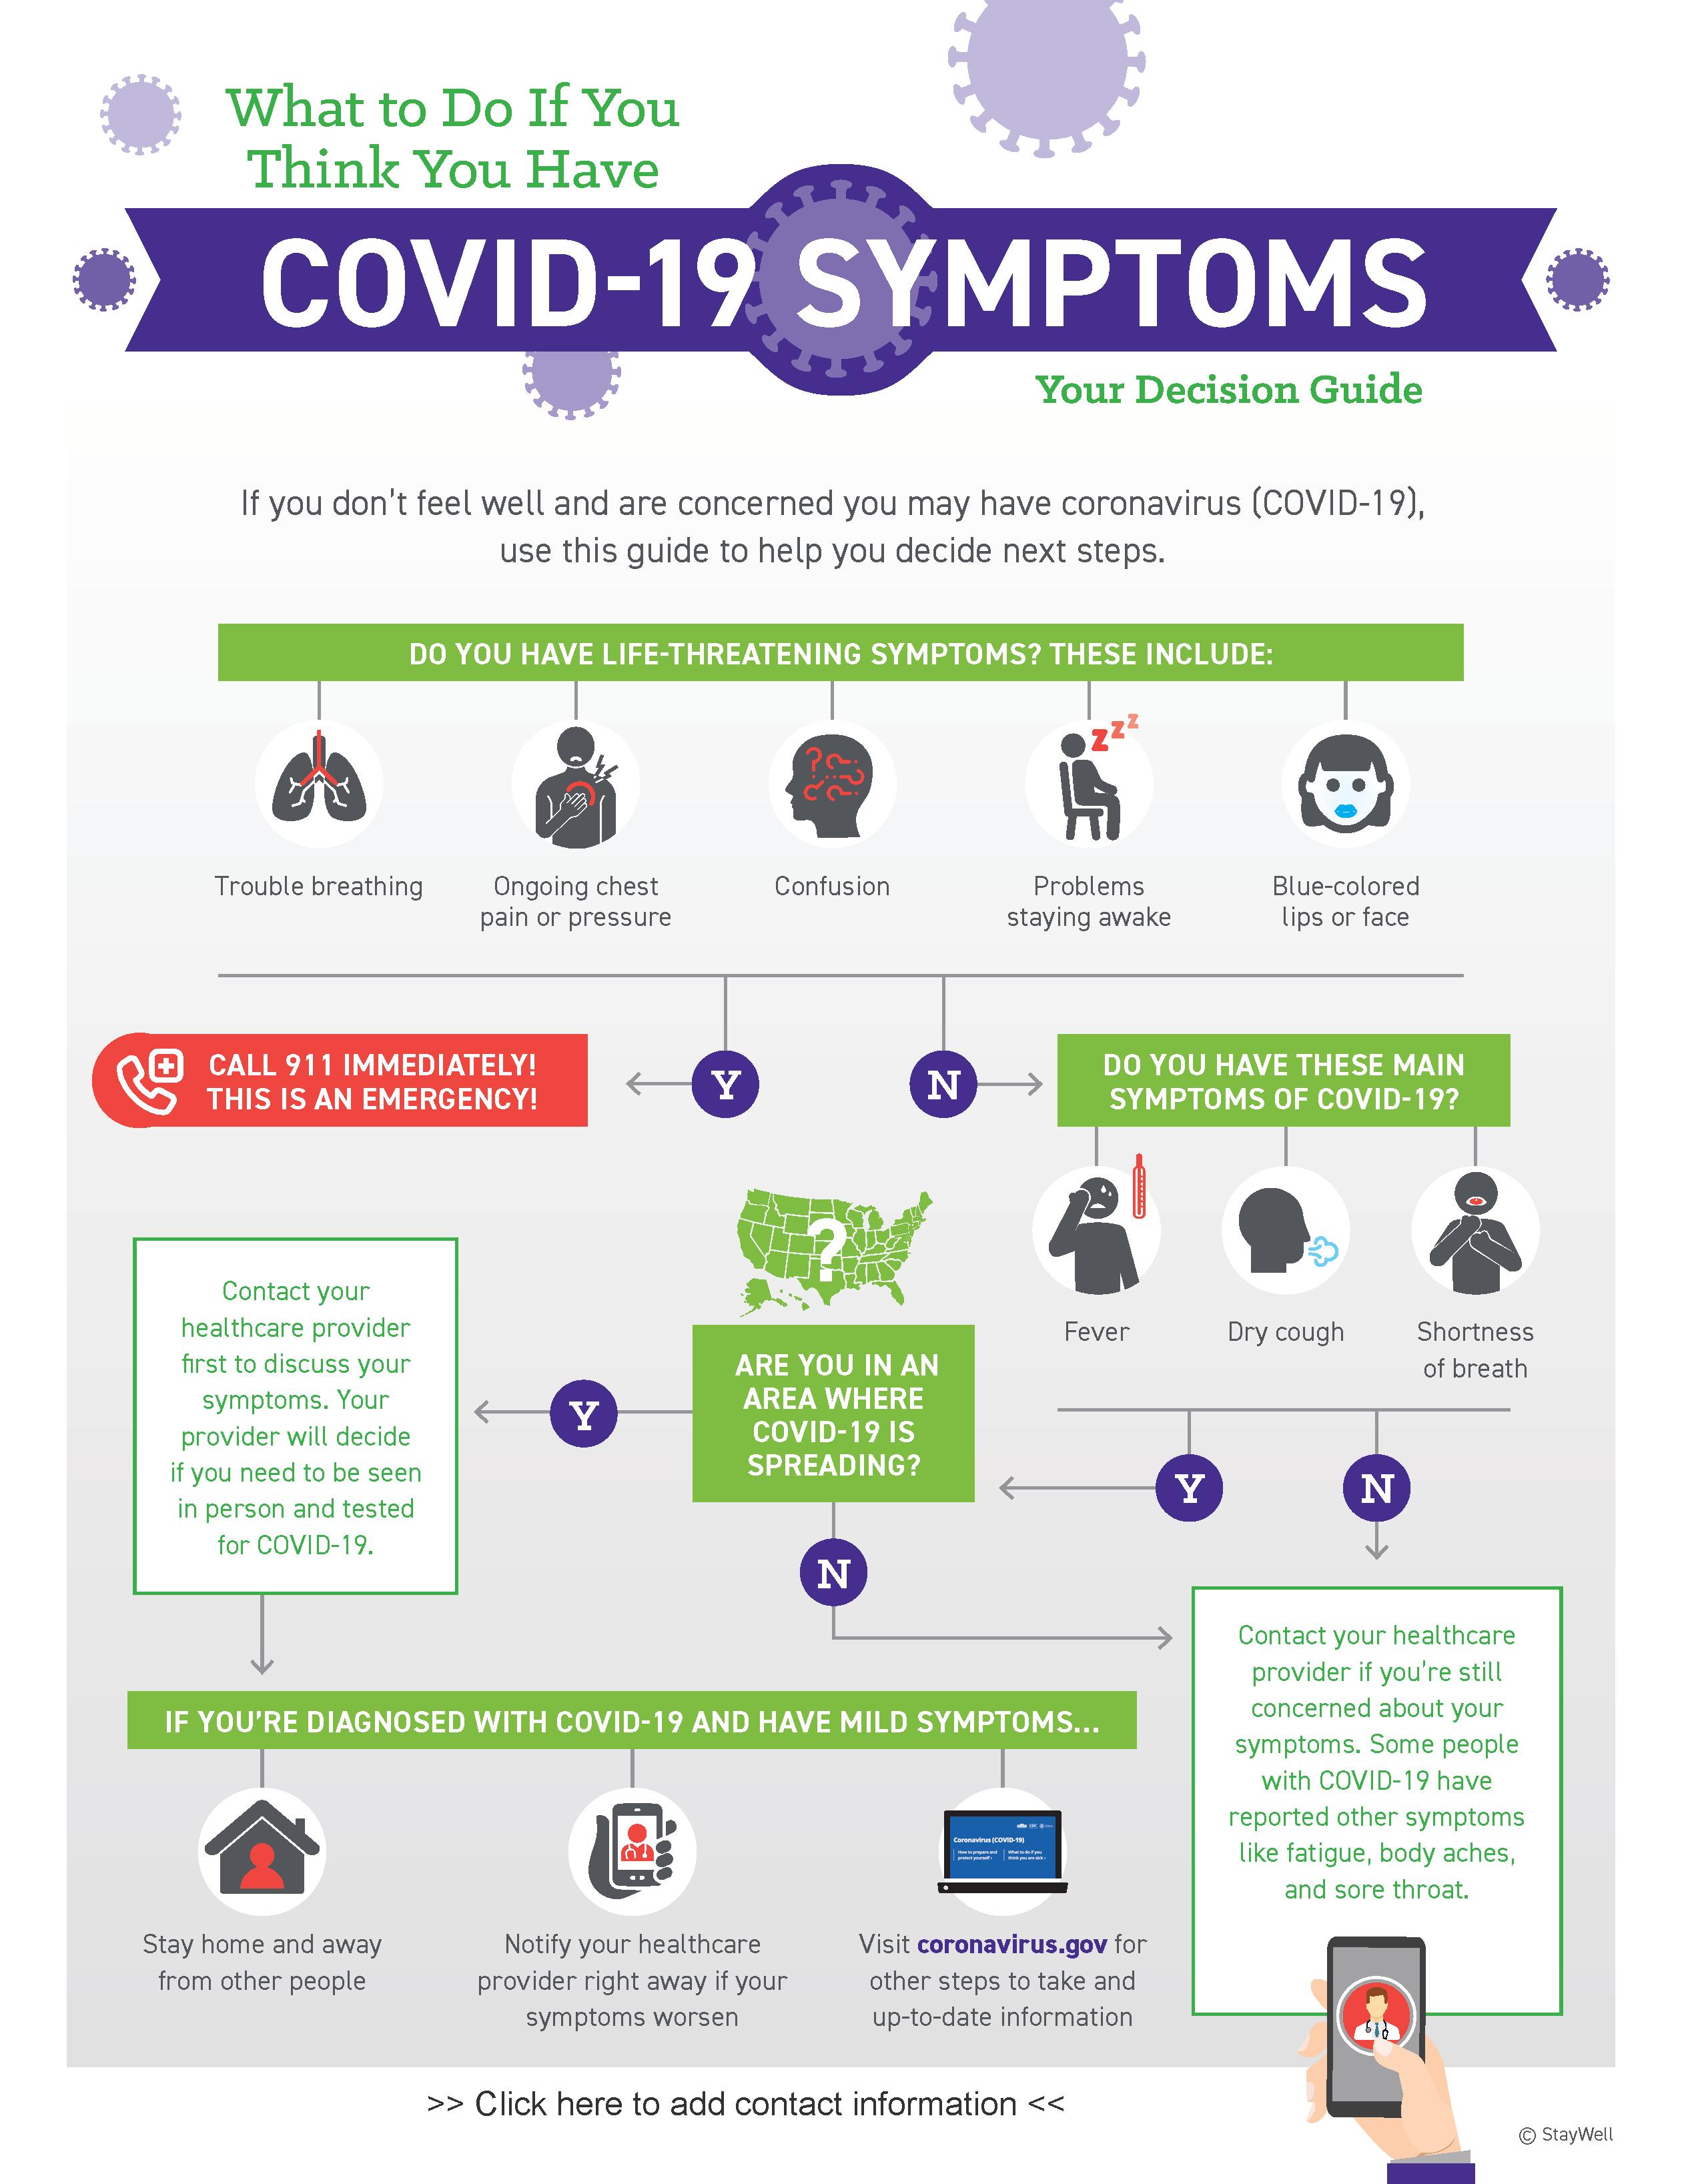 Krames_StayWell_COVID-19_Symptom_Decision_Guide